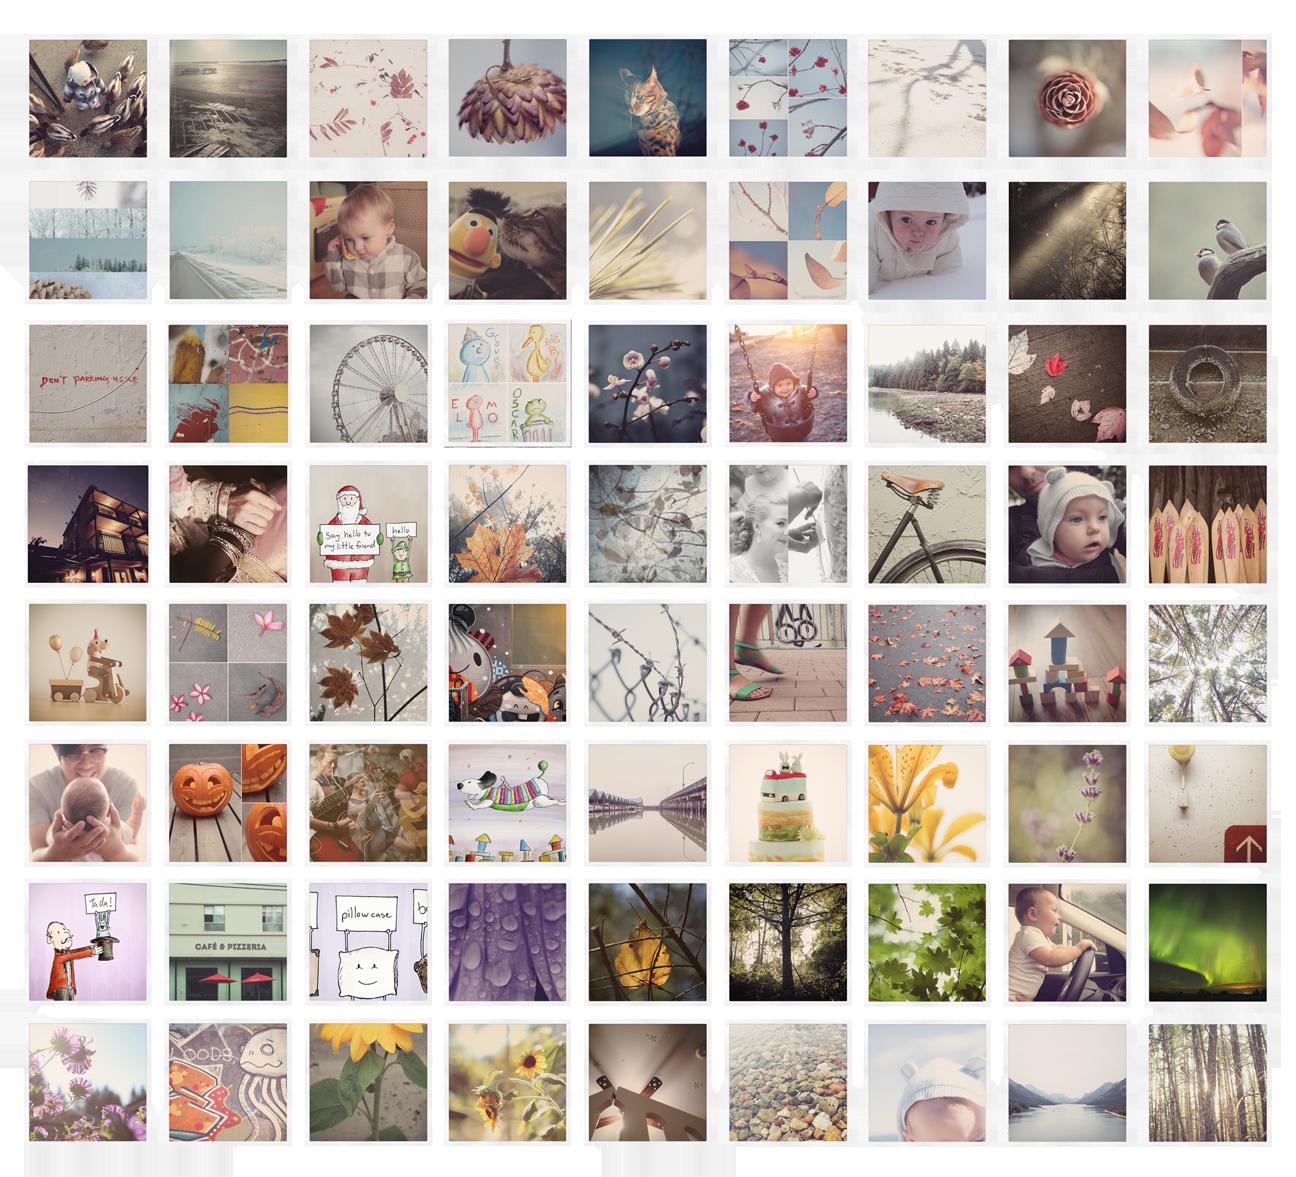 Some of my recent Instagram posts.